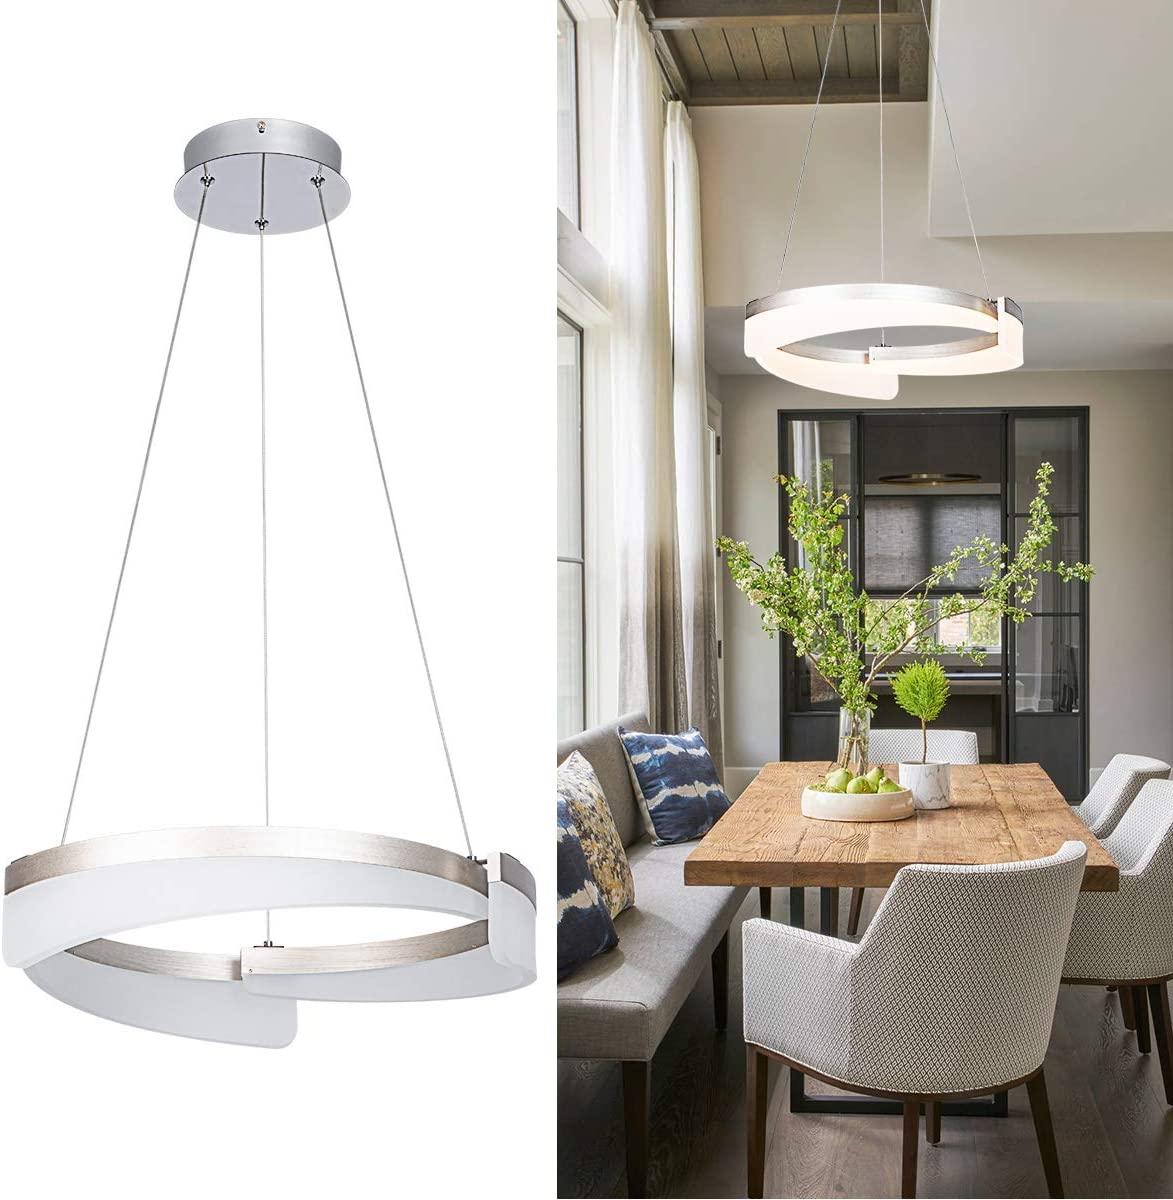 Sea Gull Lighting 6525401-04 Hudson Street One-Light Pendant Hanging Modern Light Fixture, Satin Aluminum Finish